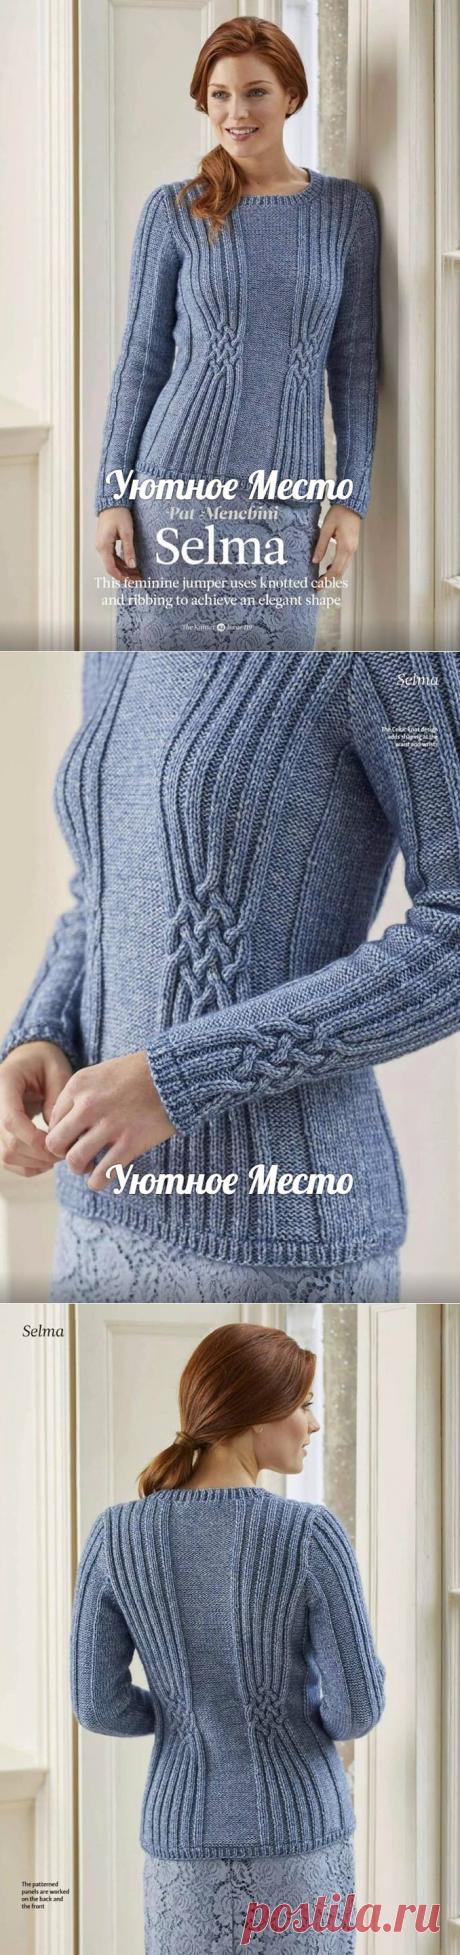 "Пуловер спицами ""Selma """